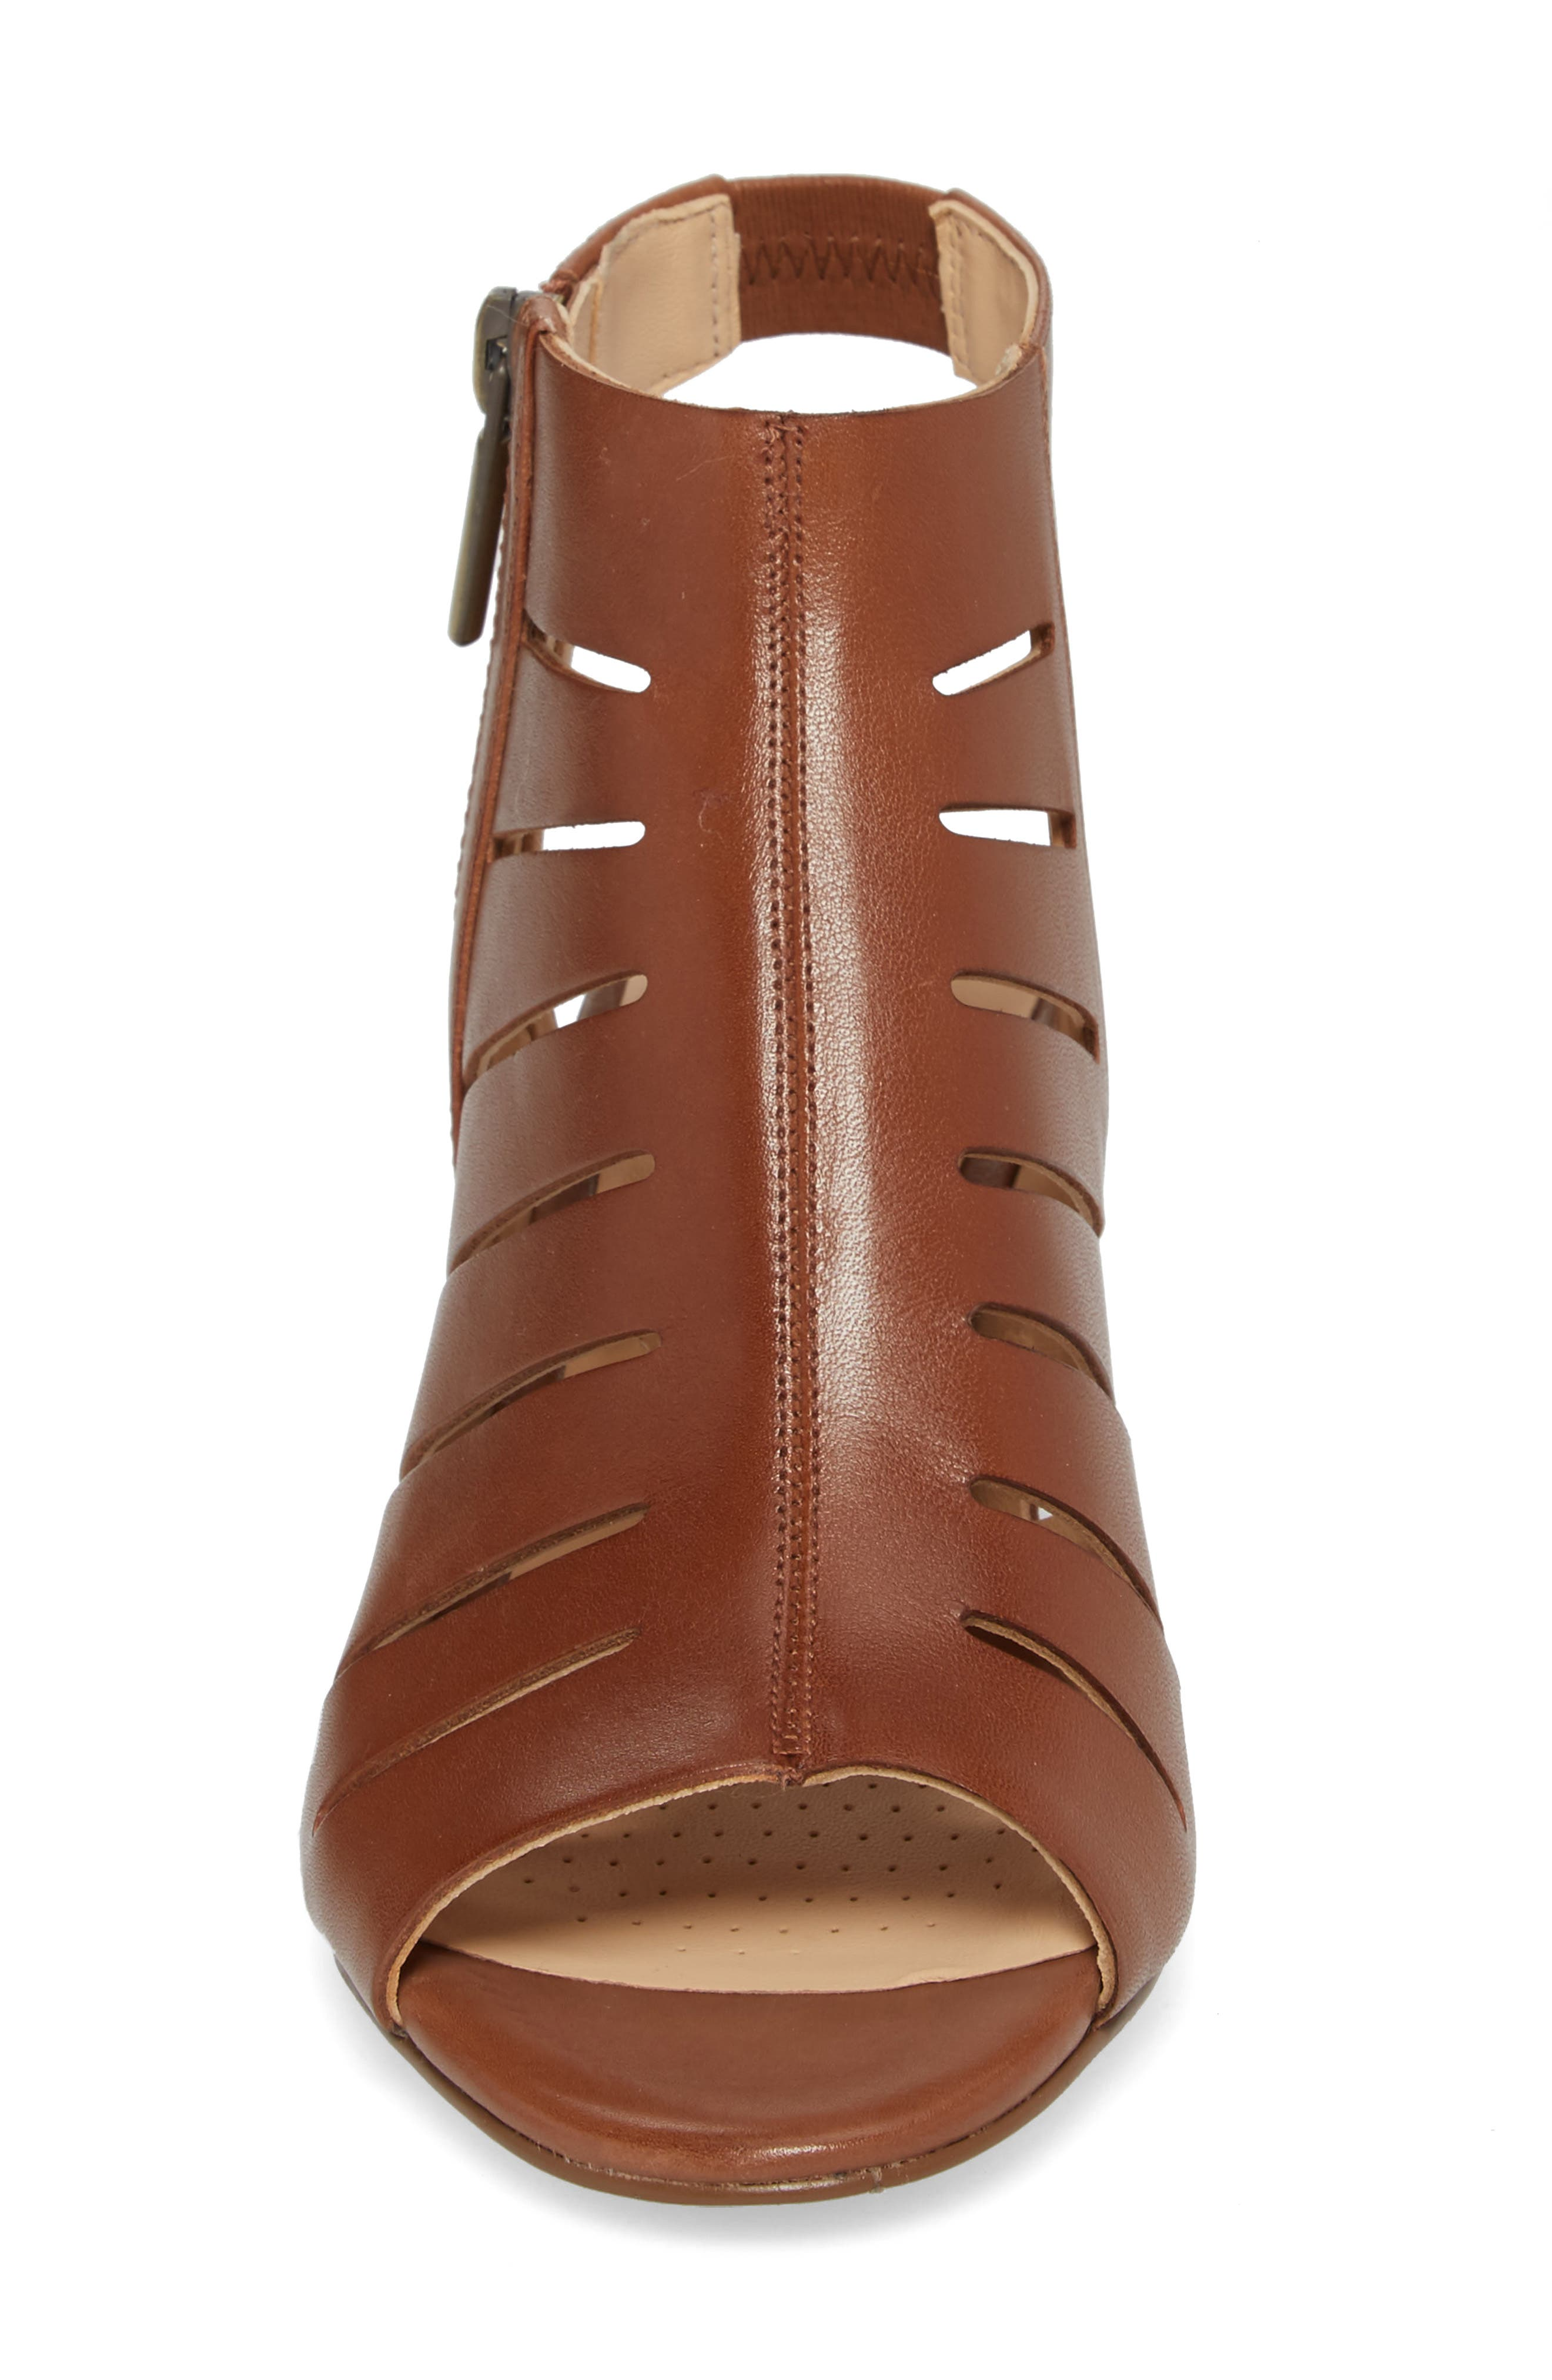 Deloria Ivy Sandal,                             Alternate thumbnail 4, color,                             Tan Leather